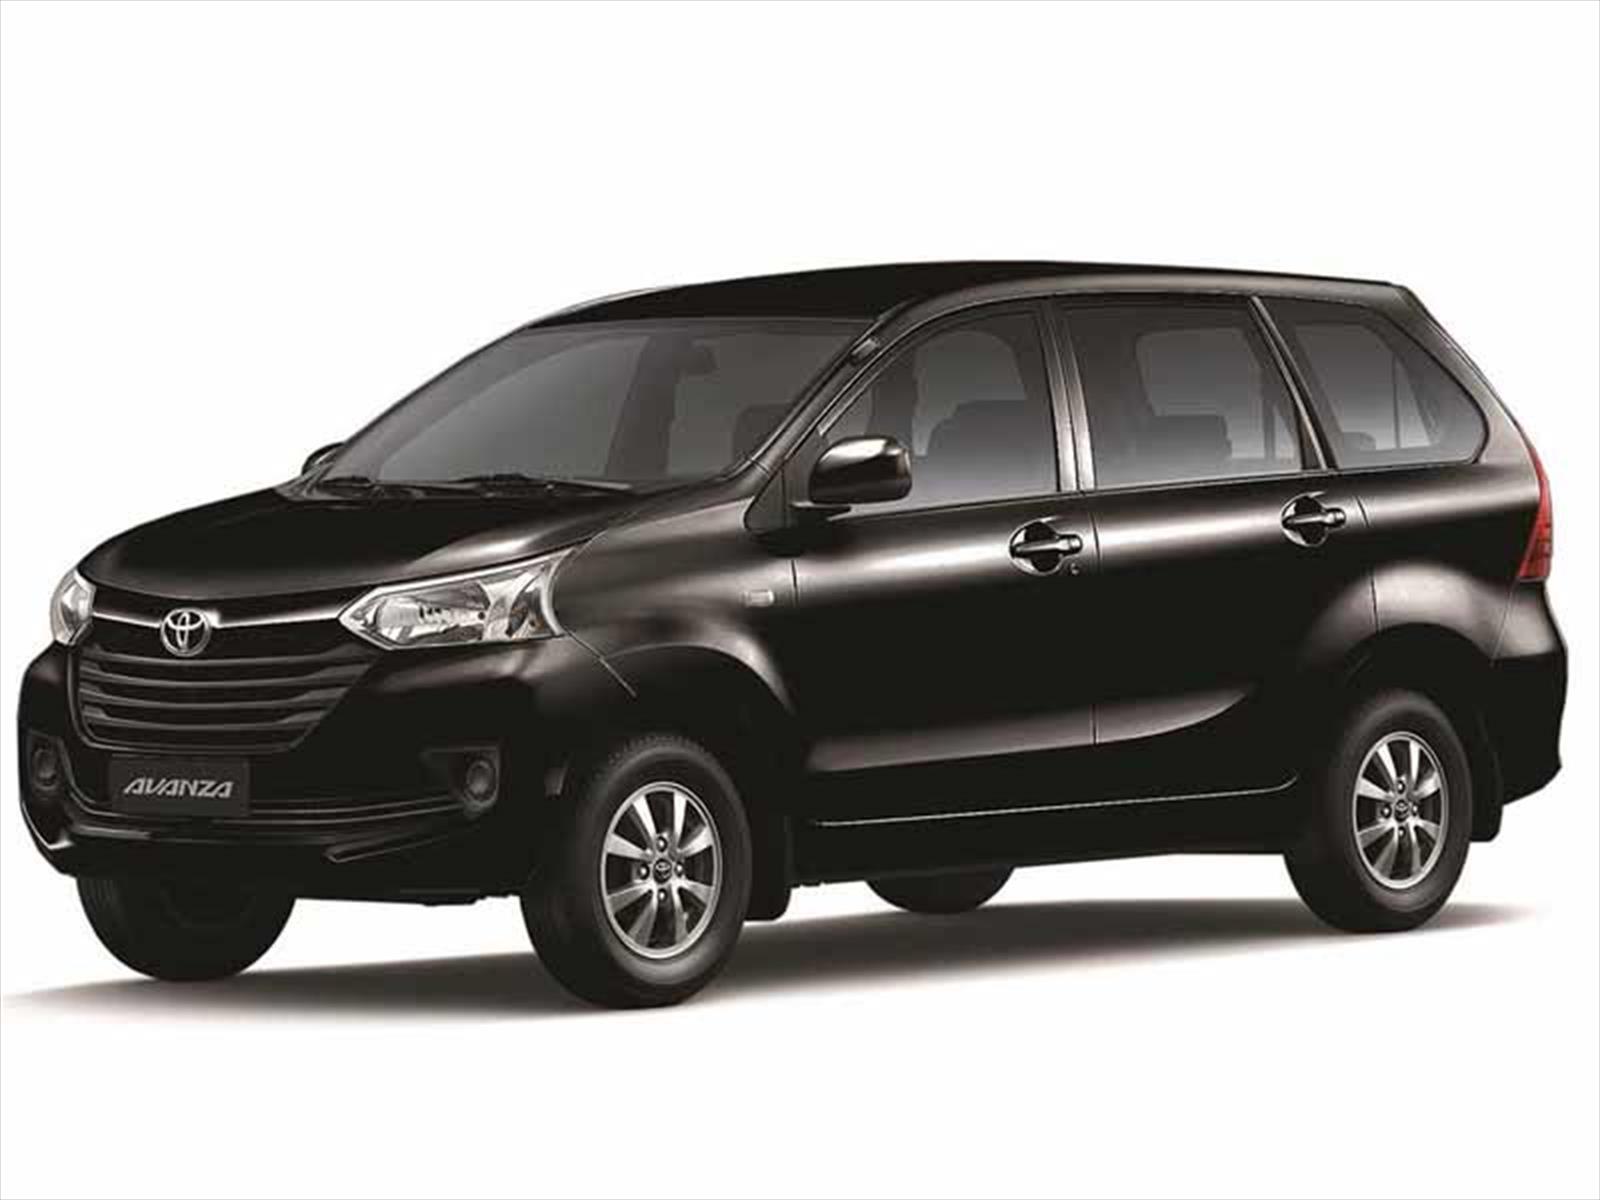 Avanza Toyota 2018 >> Toyota Avanza 2016 llega a México desde $198,800 pesos - Autocosmos.com